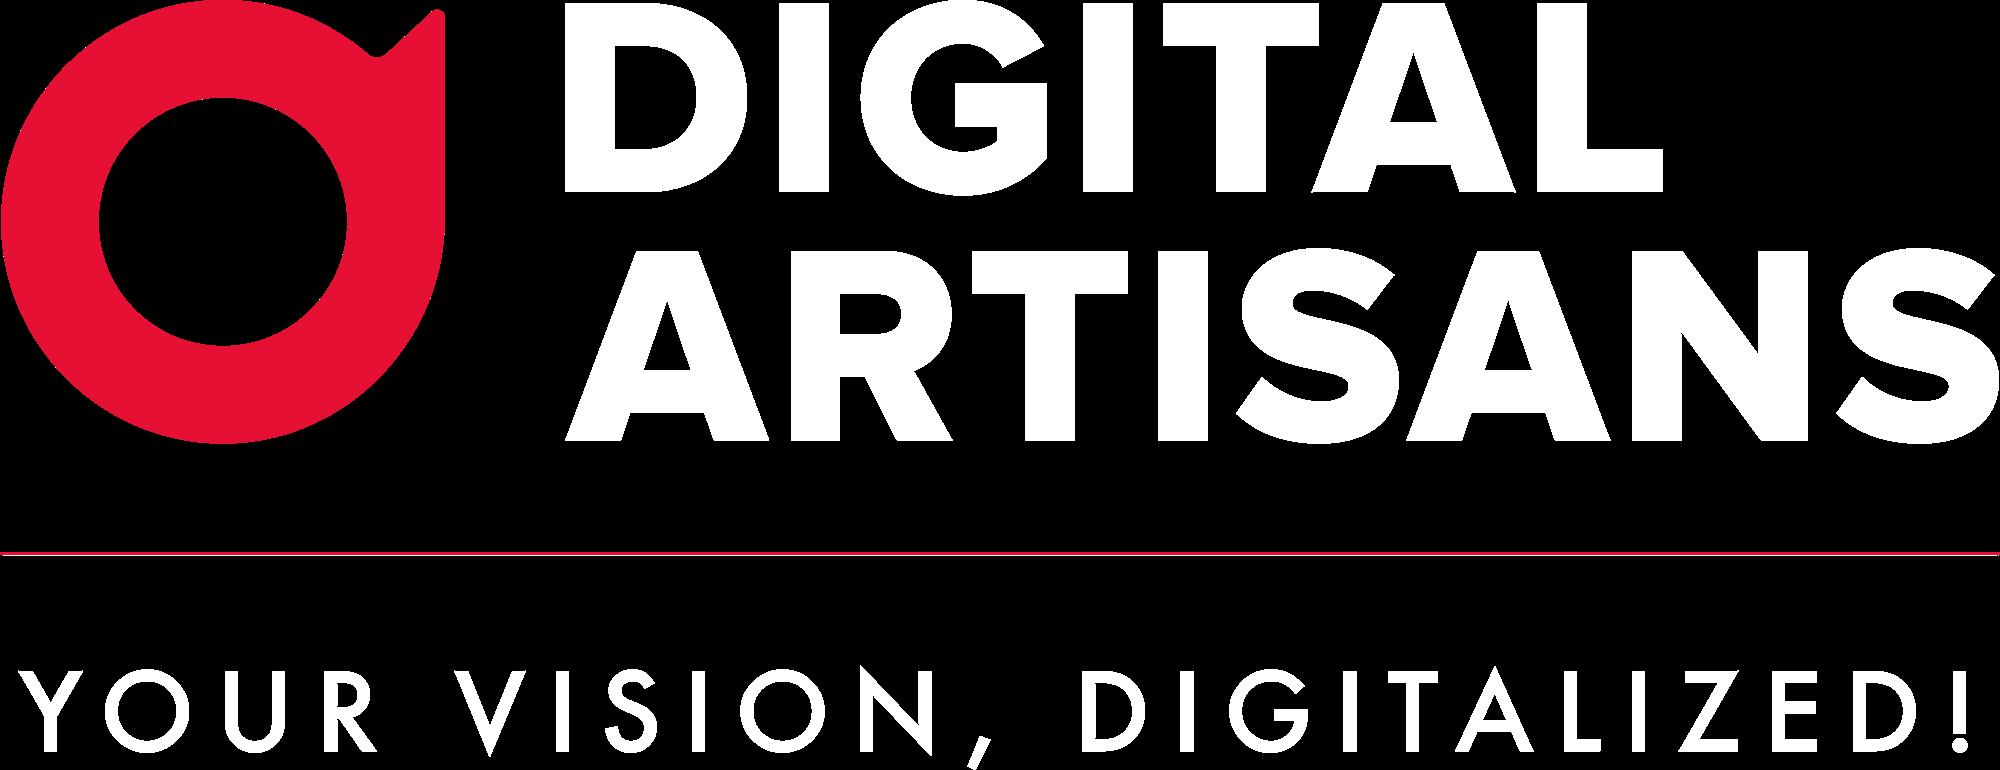 Digital Artisans